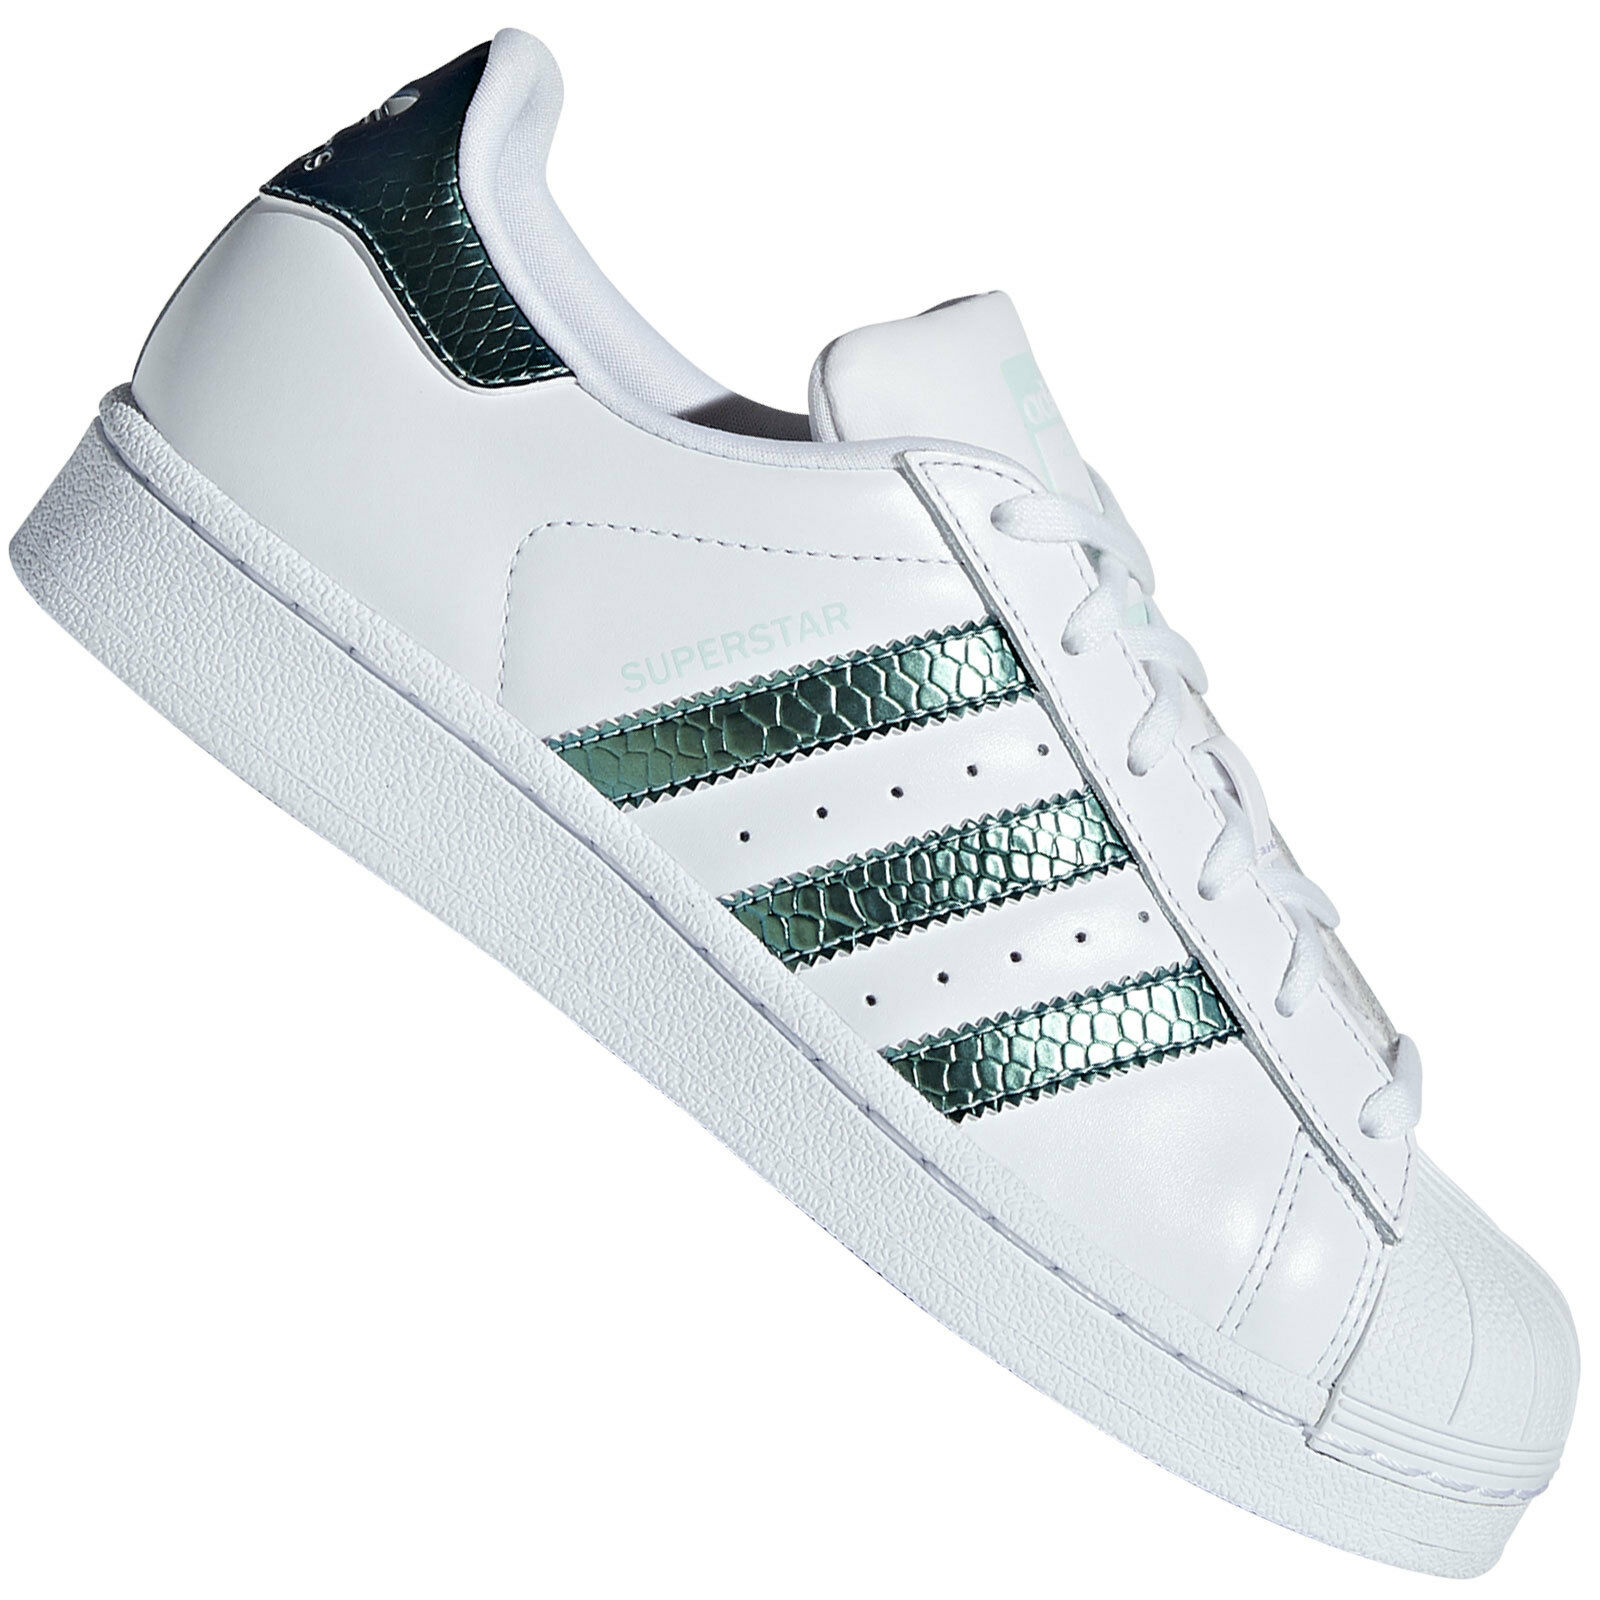 Adidas Originals Superstar Junior Bambino Scarpe Sneaker Shimmer Metallizzato